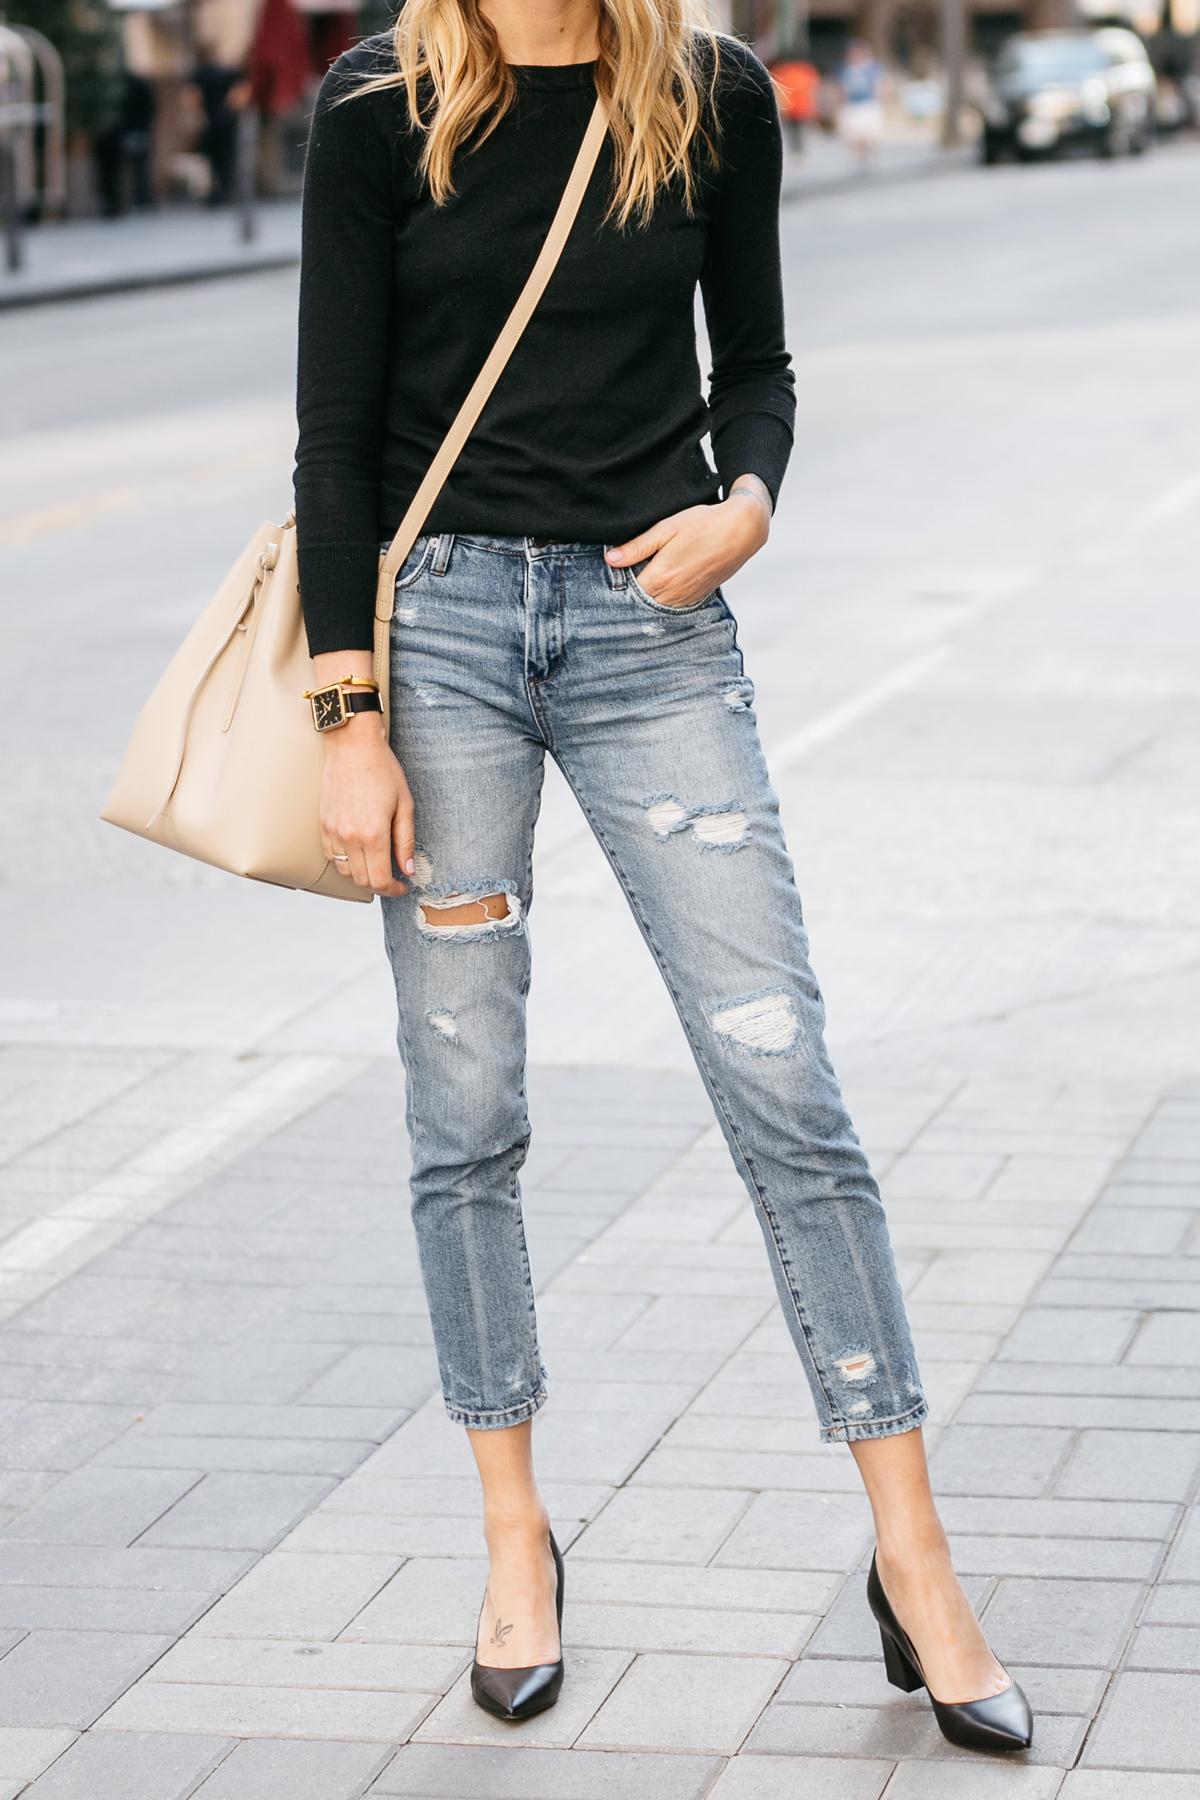 Fashion Jackson, Street Style, Black Sweater, Blanknyc Ms Throwback Distressed Jeans, Mansur Gavriel Bucket Bag, Marc Fisher Zara Pumps Black